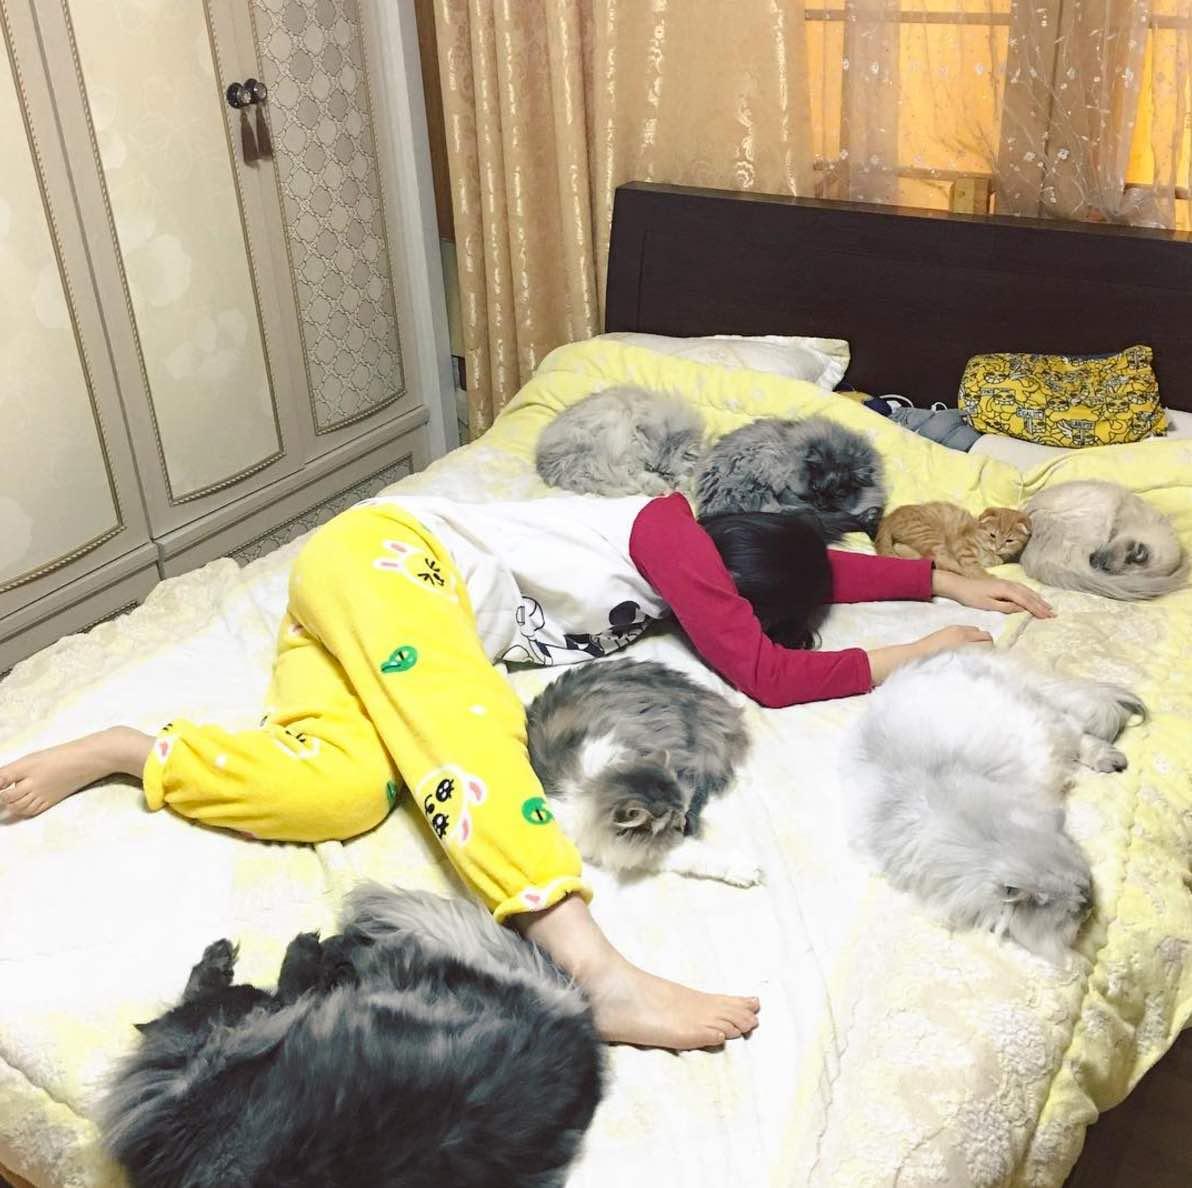 Fullsize Of Dog Wants A Kitty